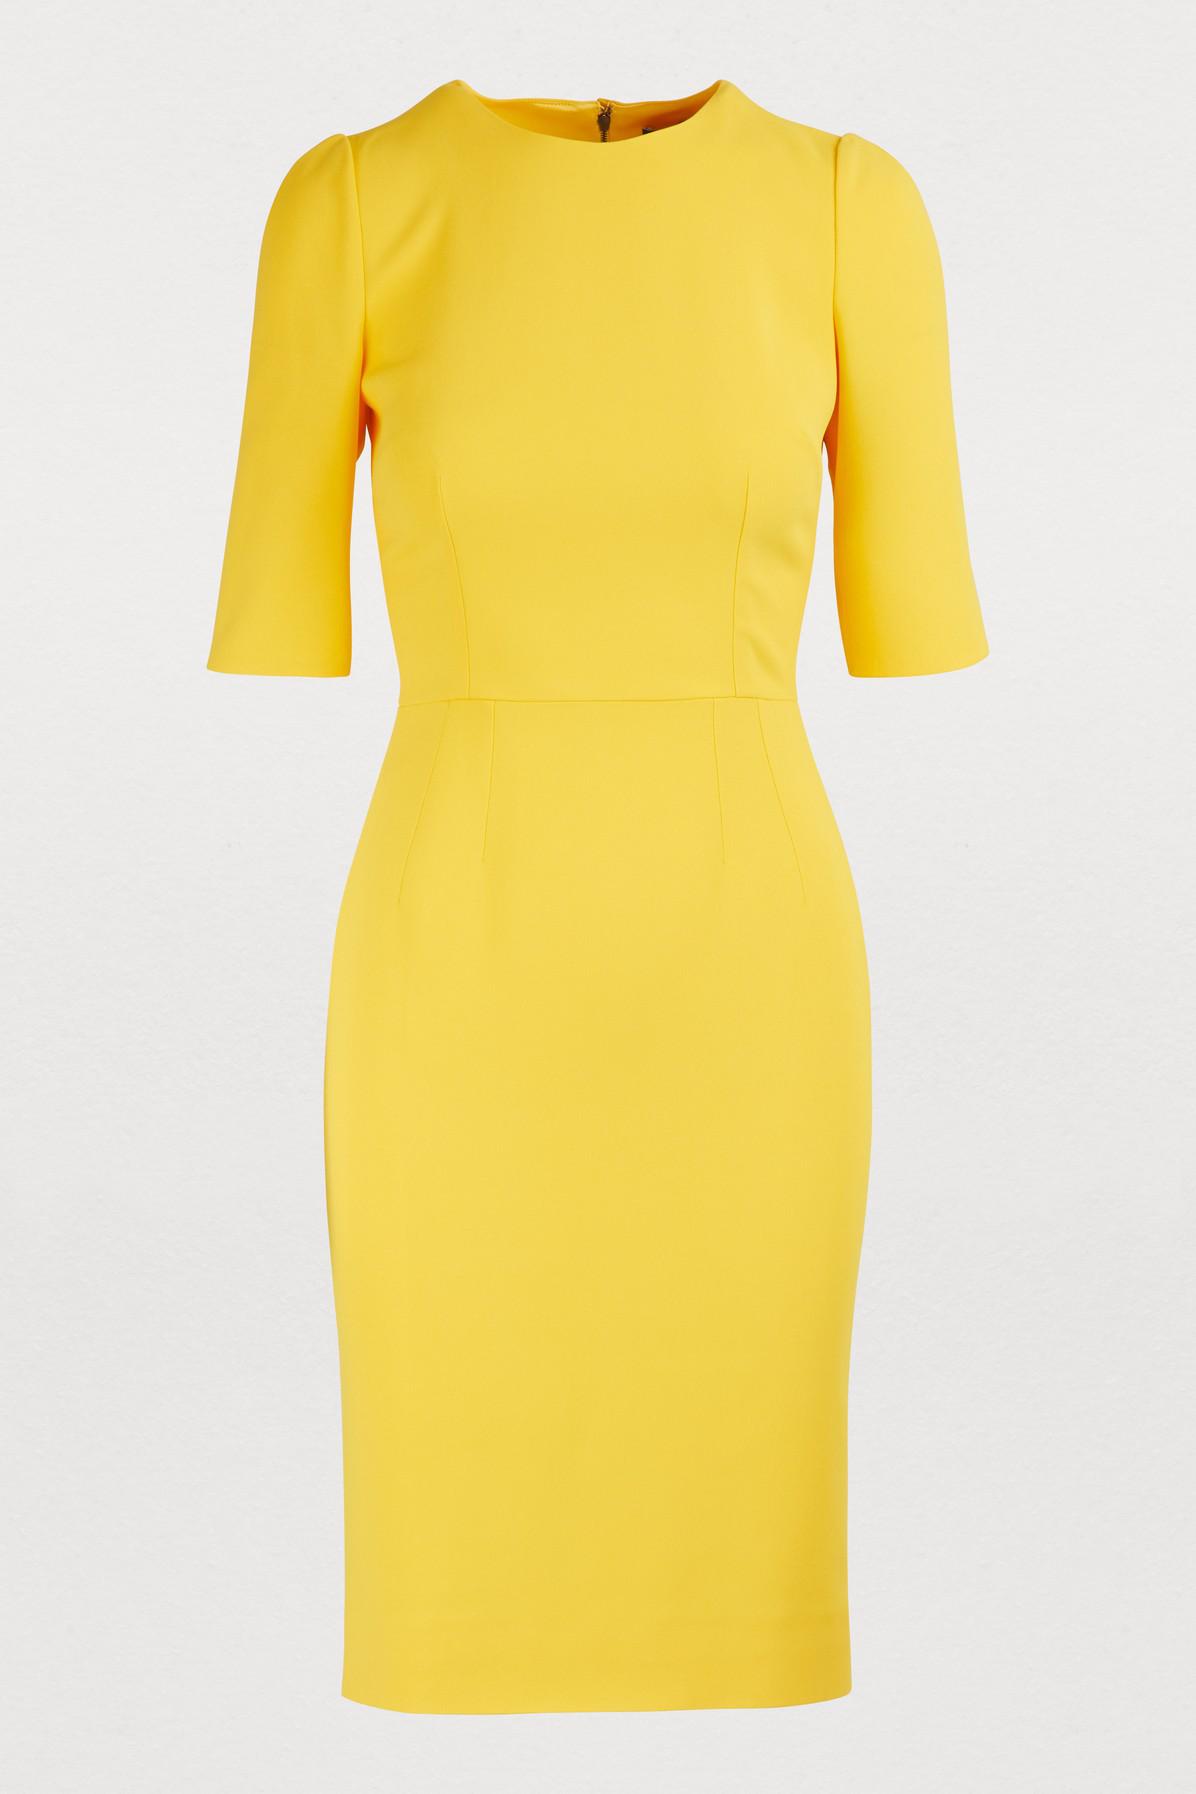 Dolce & Gabbana Stretch Midi Dress In Yellow